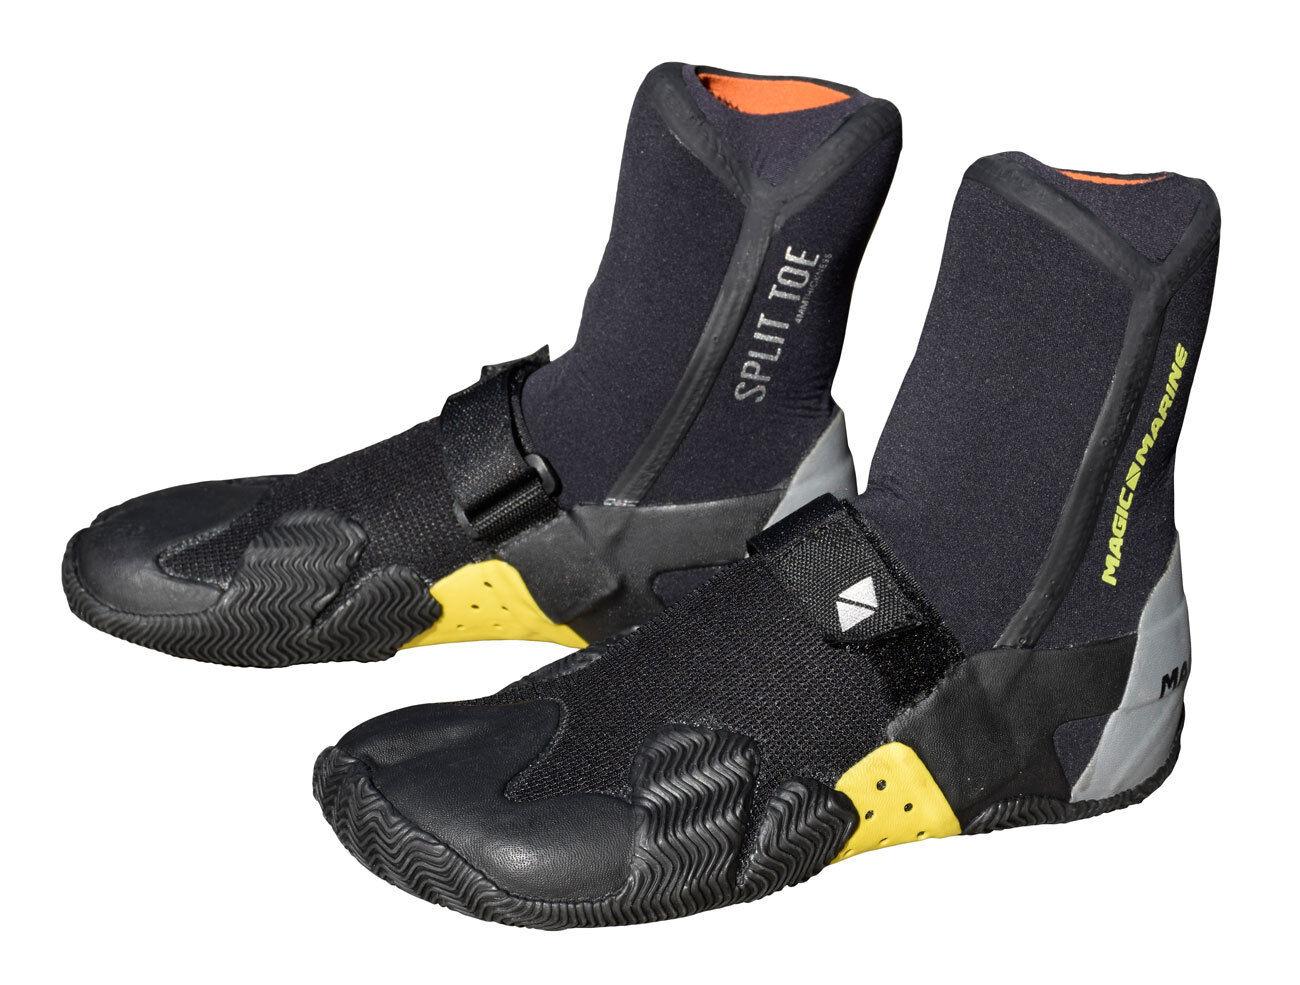 Magic Marine Unisex Water shoes 4mm Neoprene, Reinforced Lace, Split Toes